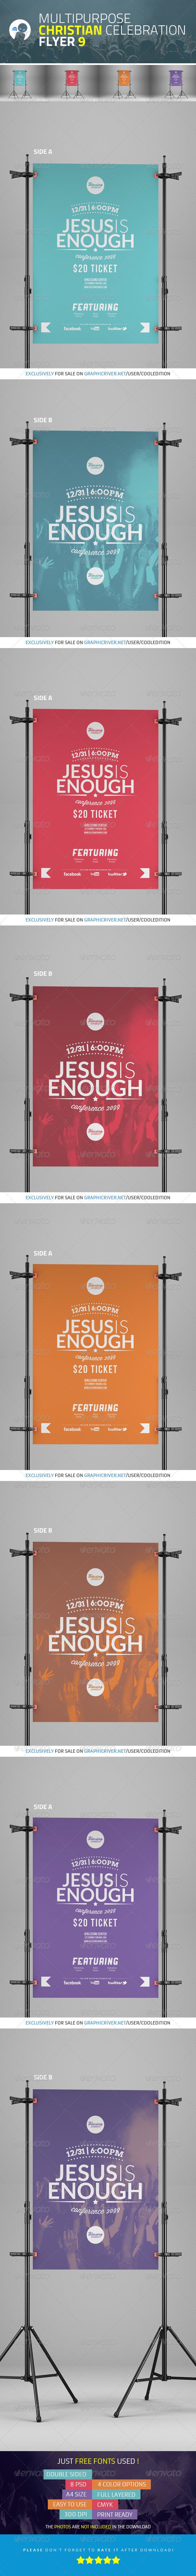 Multipurpose Christian Celebration Flyer 9 - Church Flyers